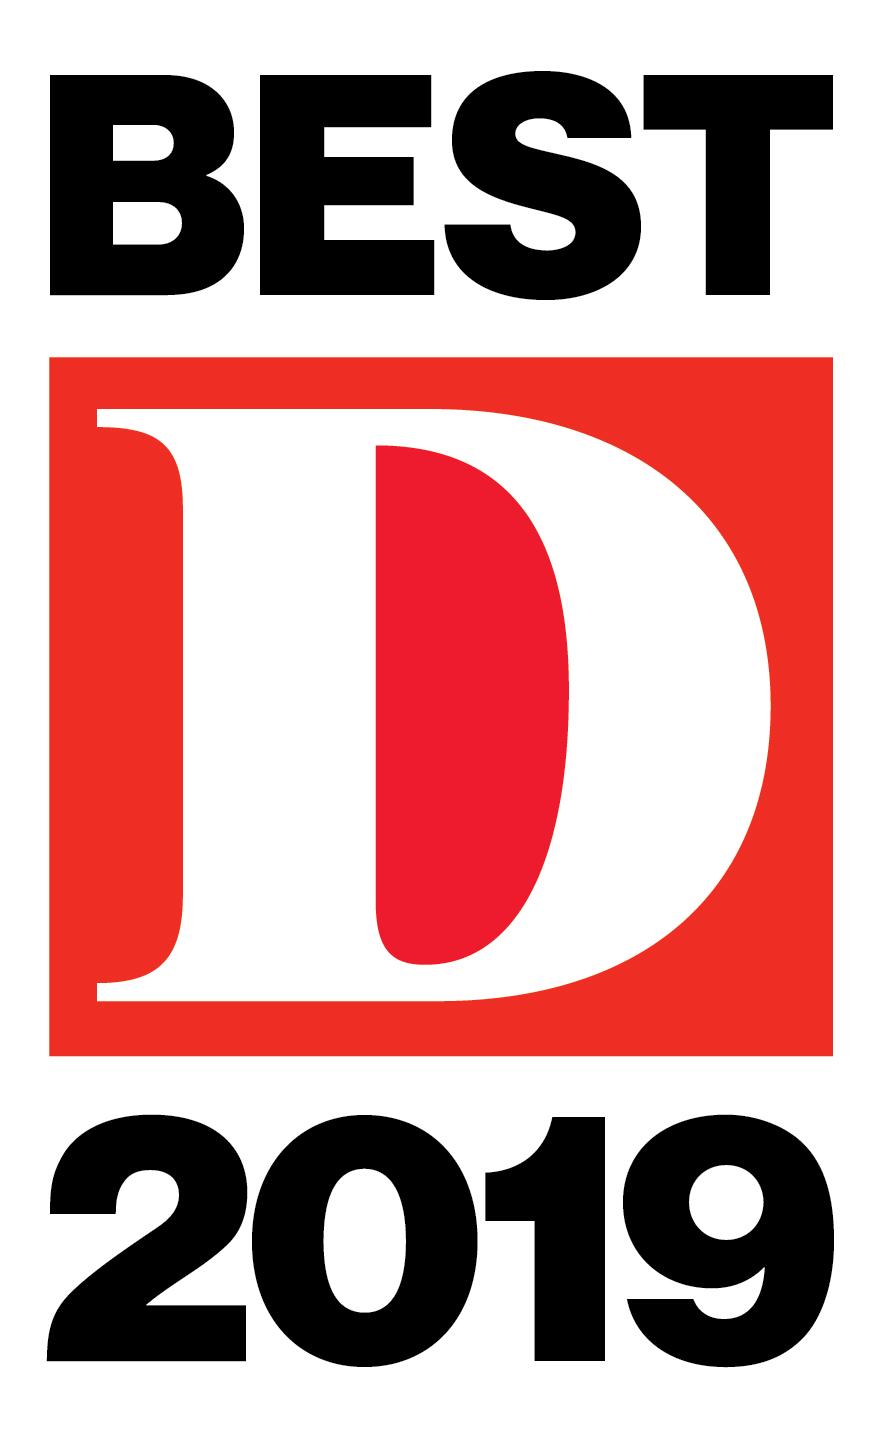 Best Dentist in Dallas 2019